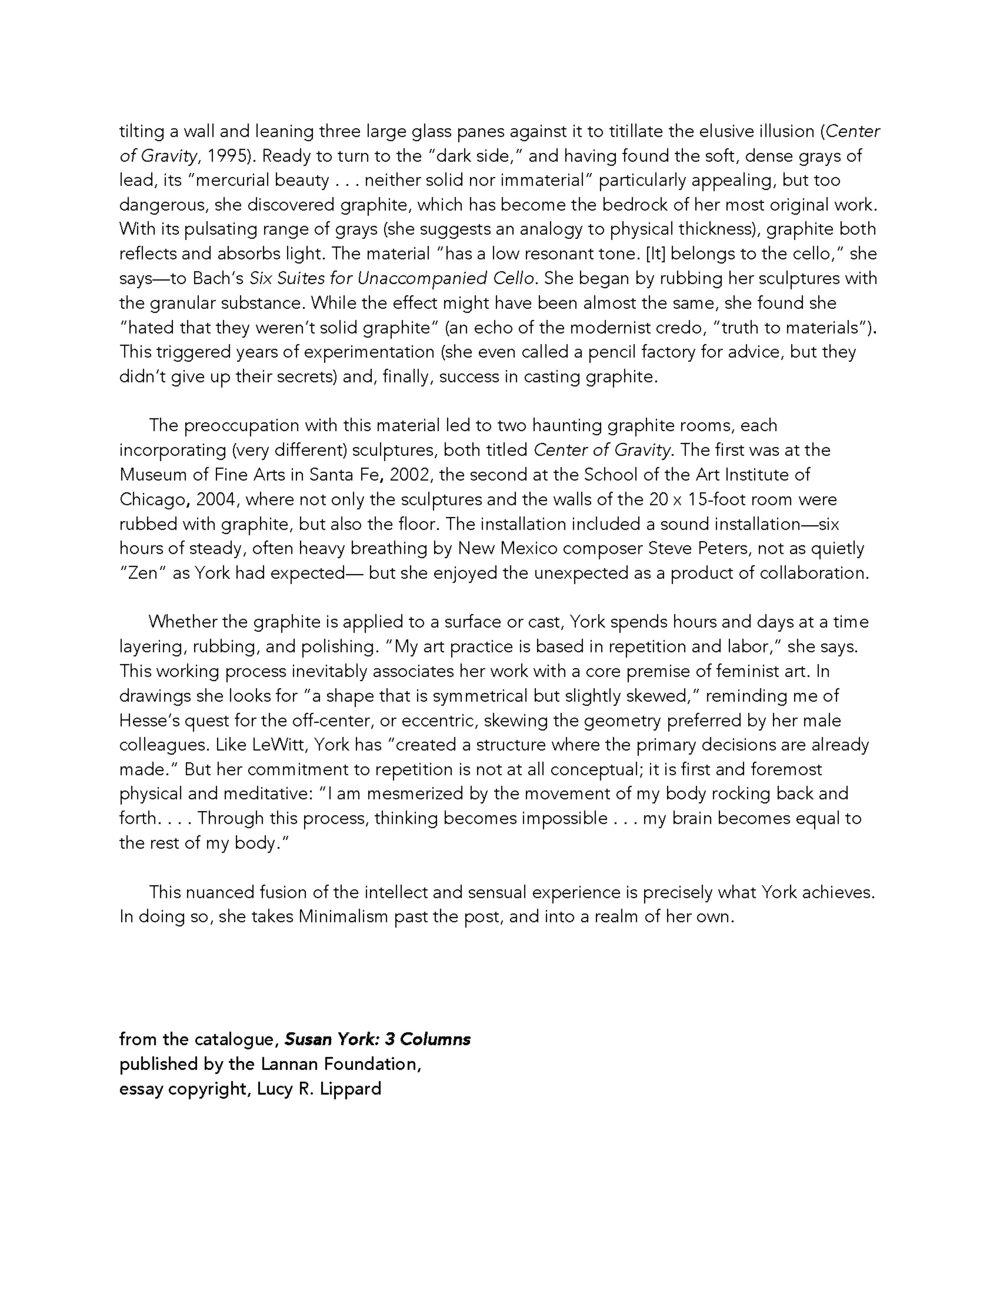 6.Lippard Essay for YORK_Lannan_Page_3.jpg